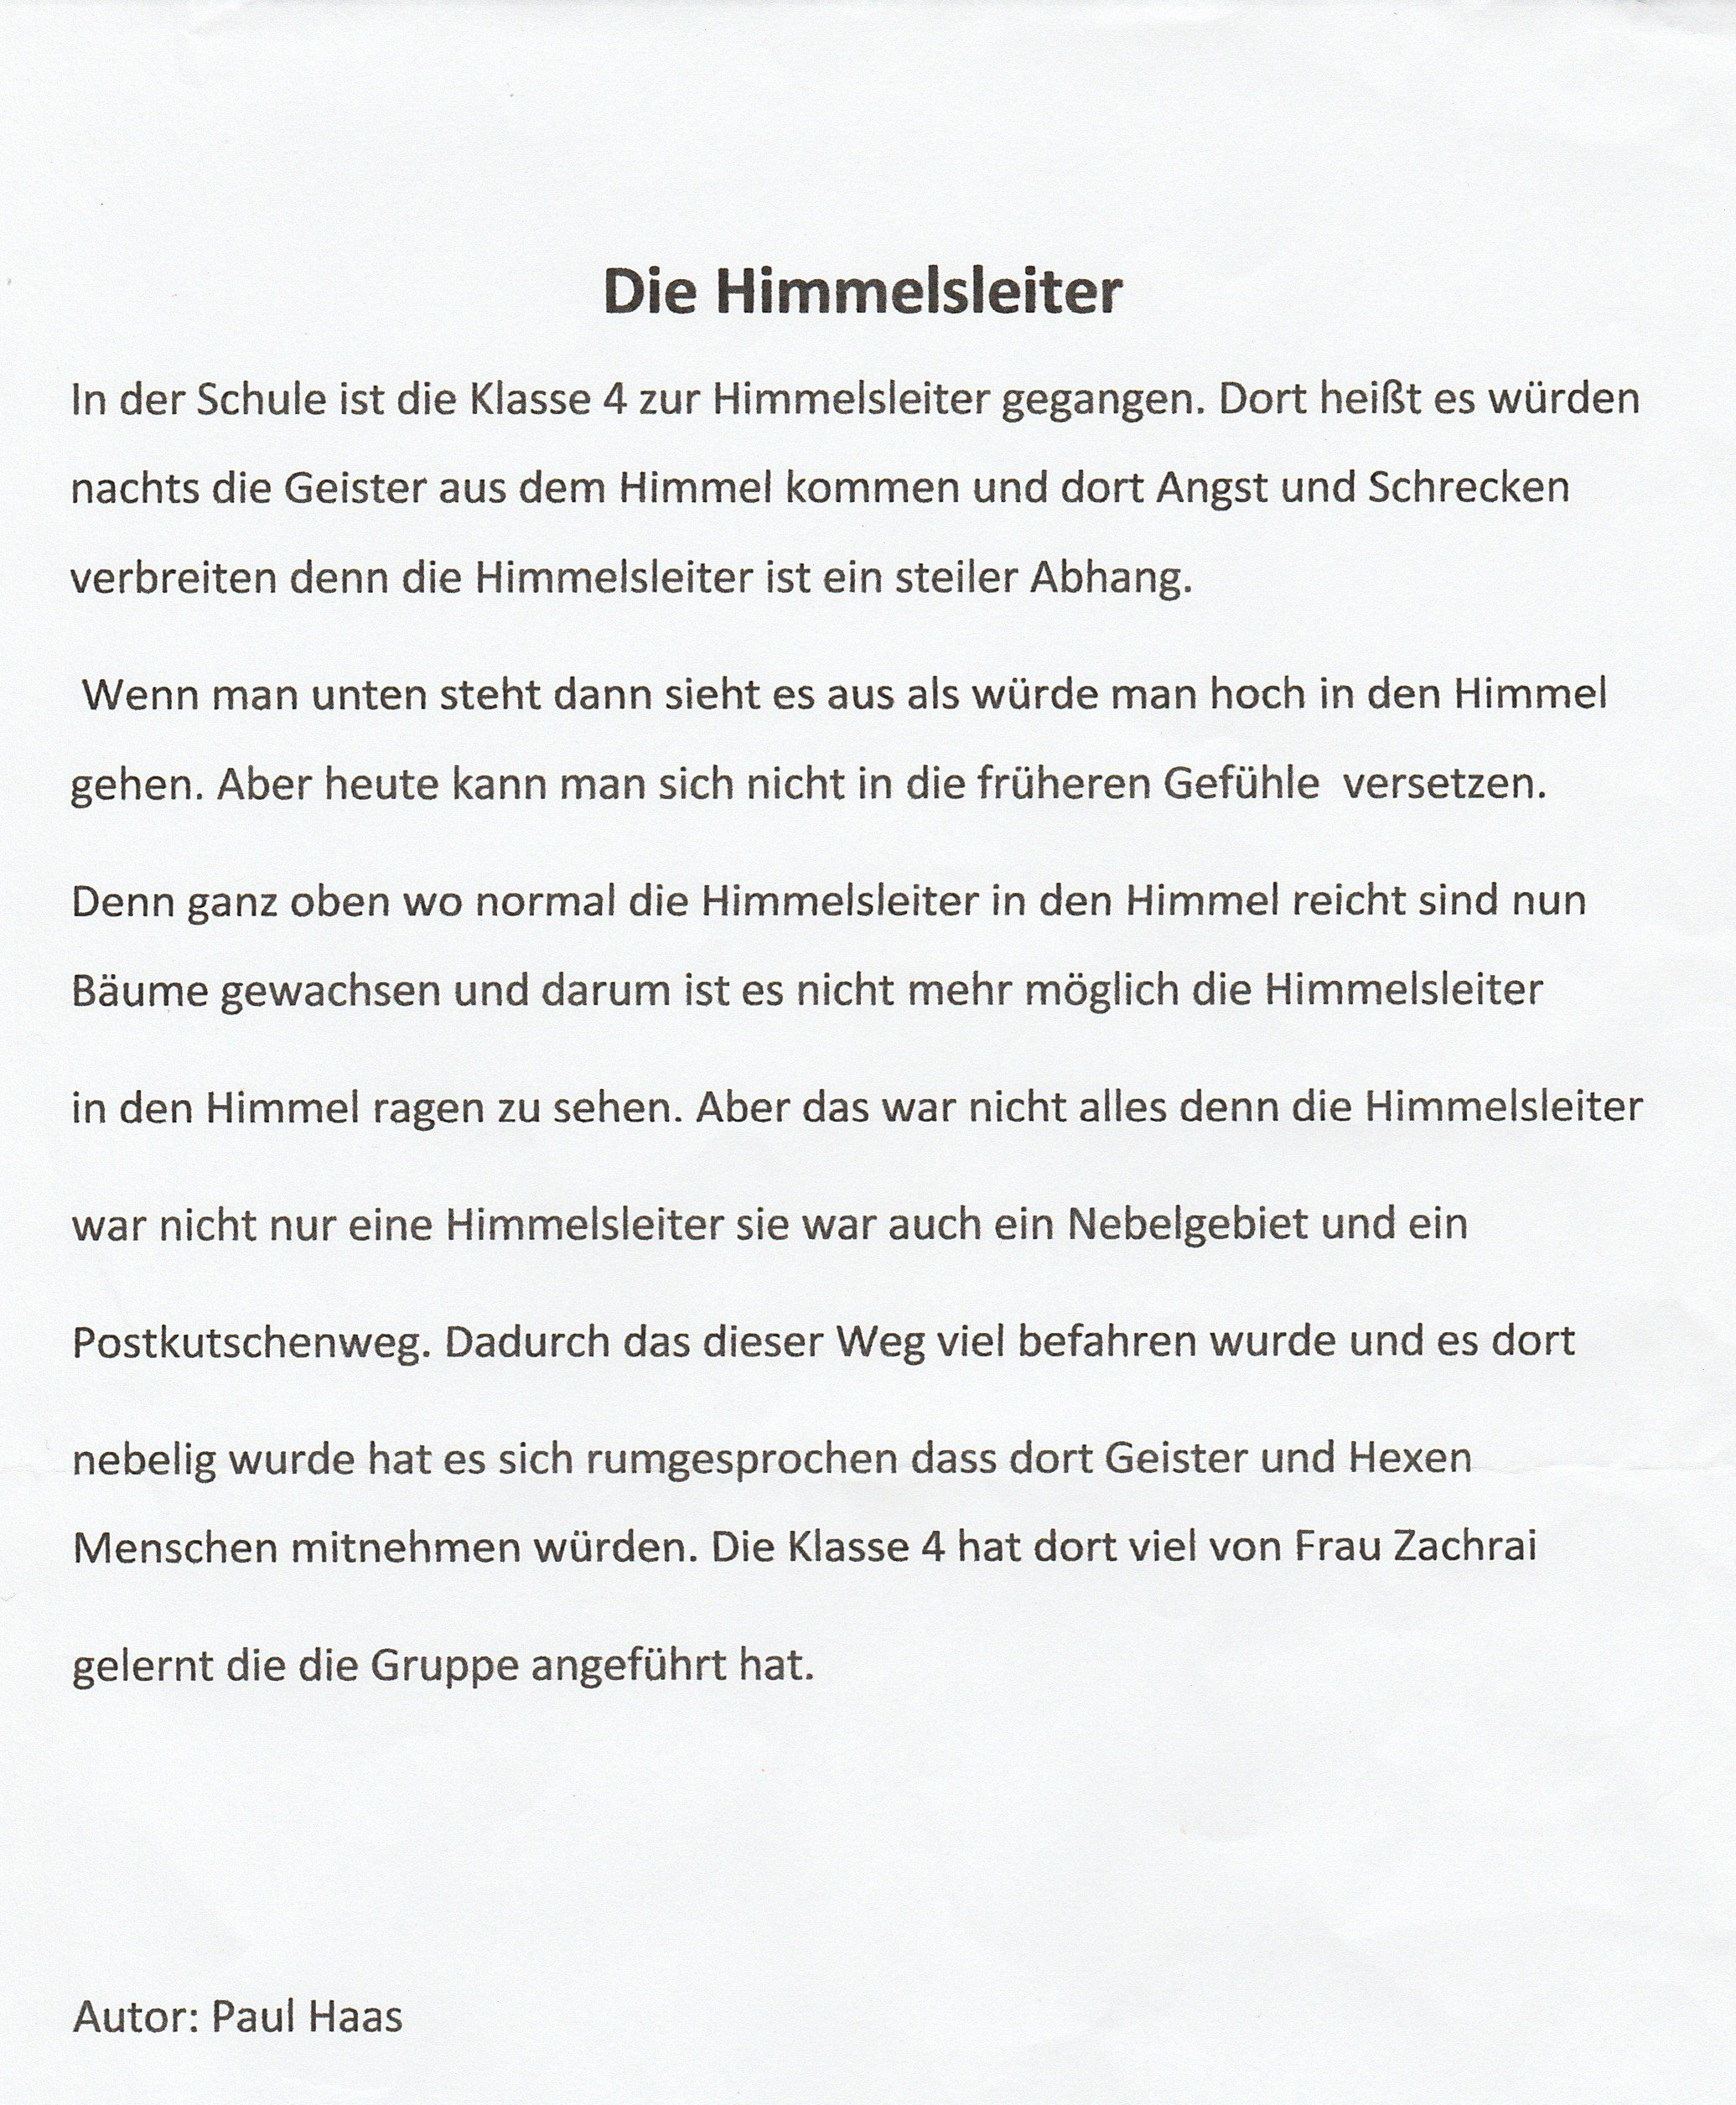 bericht-himmelsleiter-paul